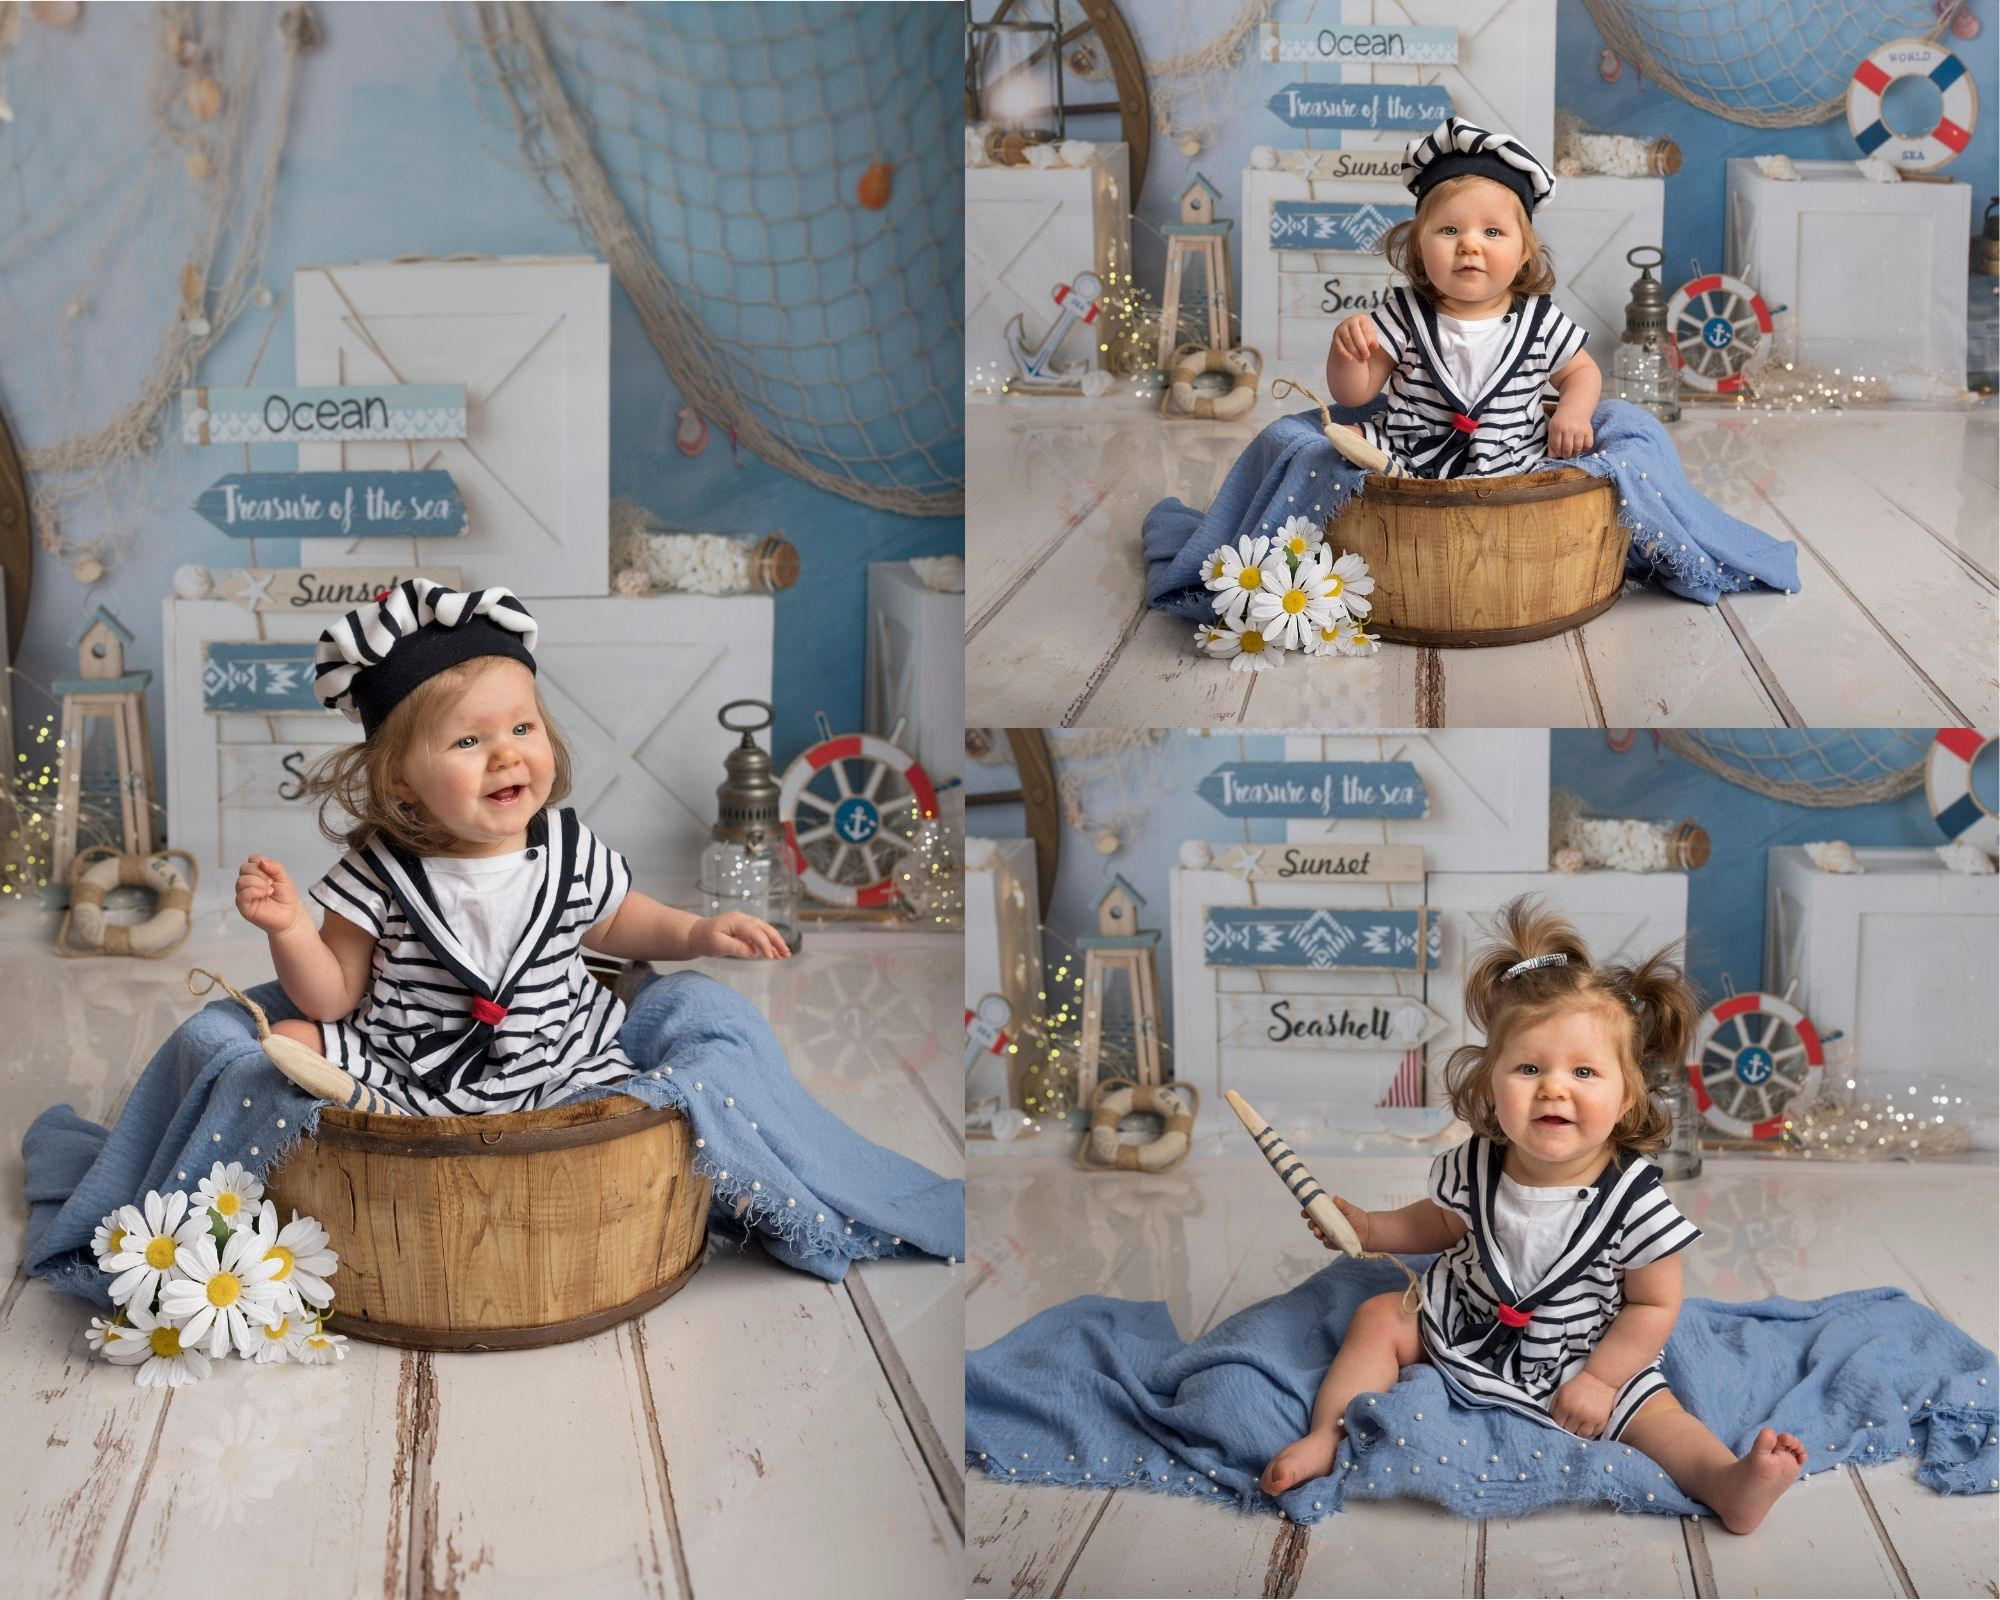 photographe-bebe-seance-smas-the-cake-strasbourg-clover-photographies-2